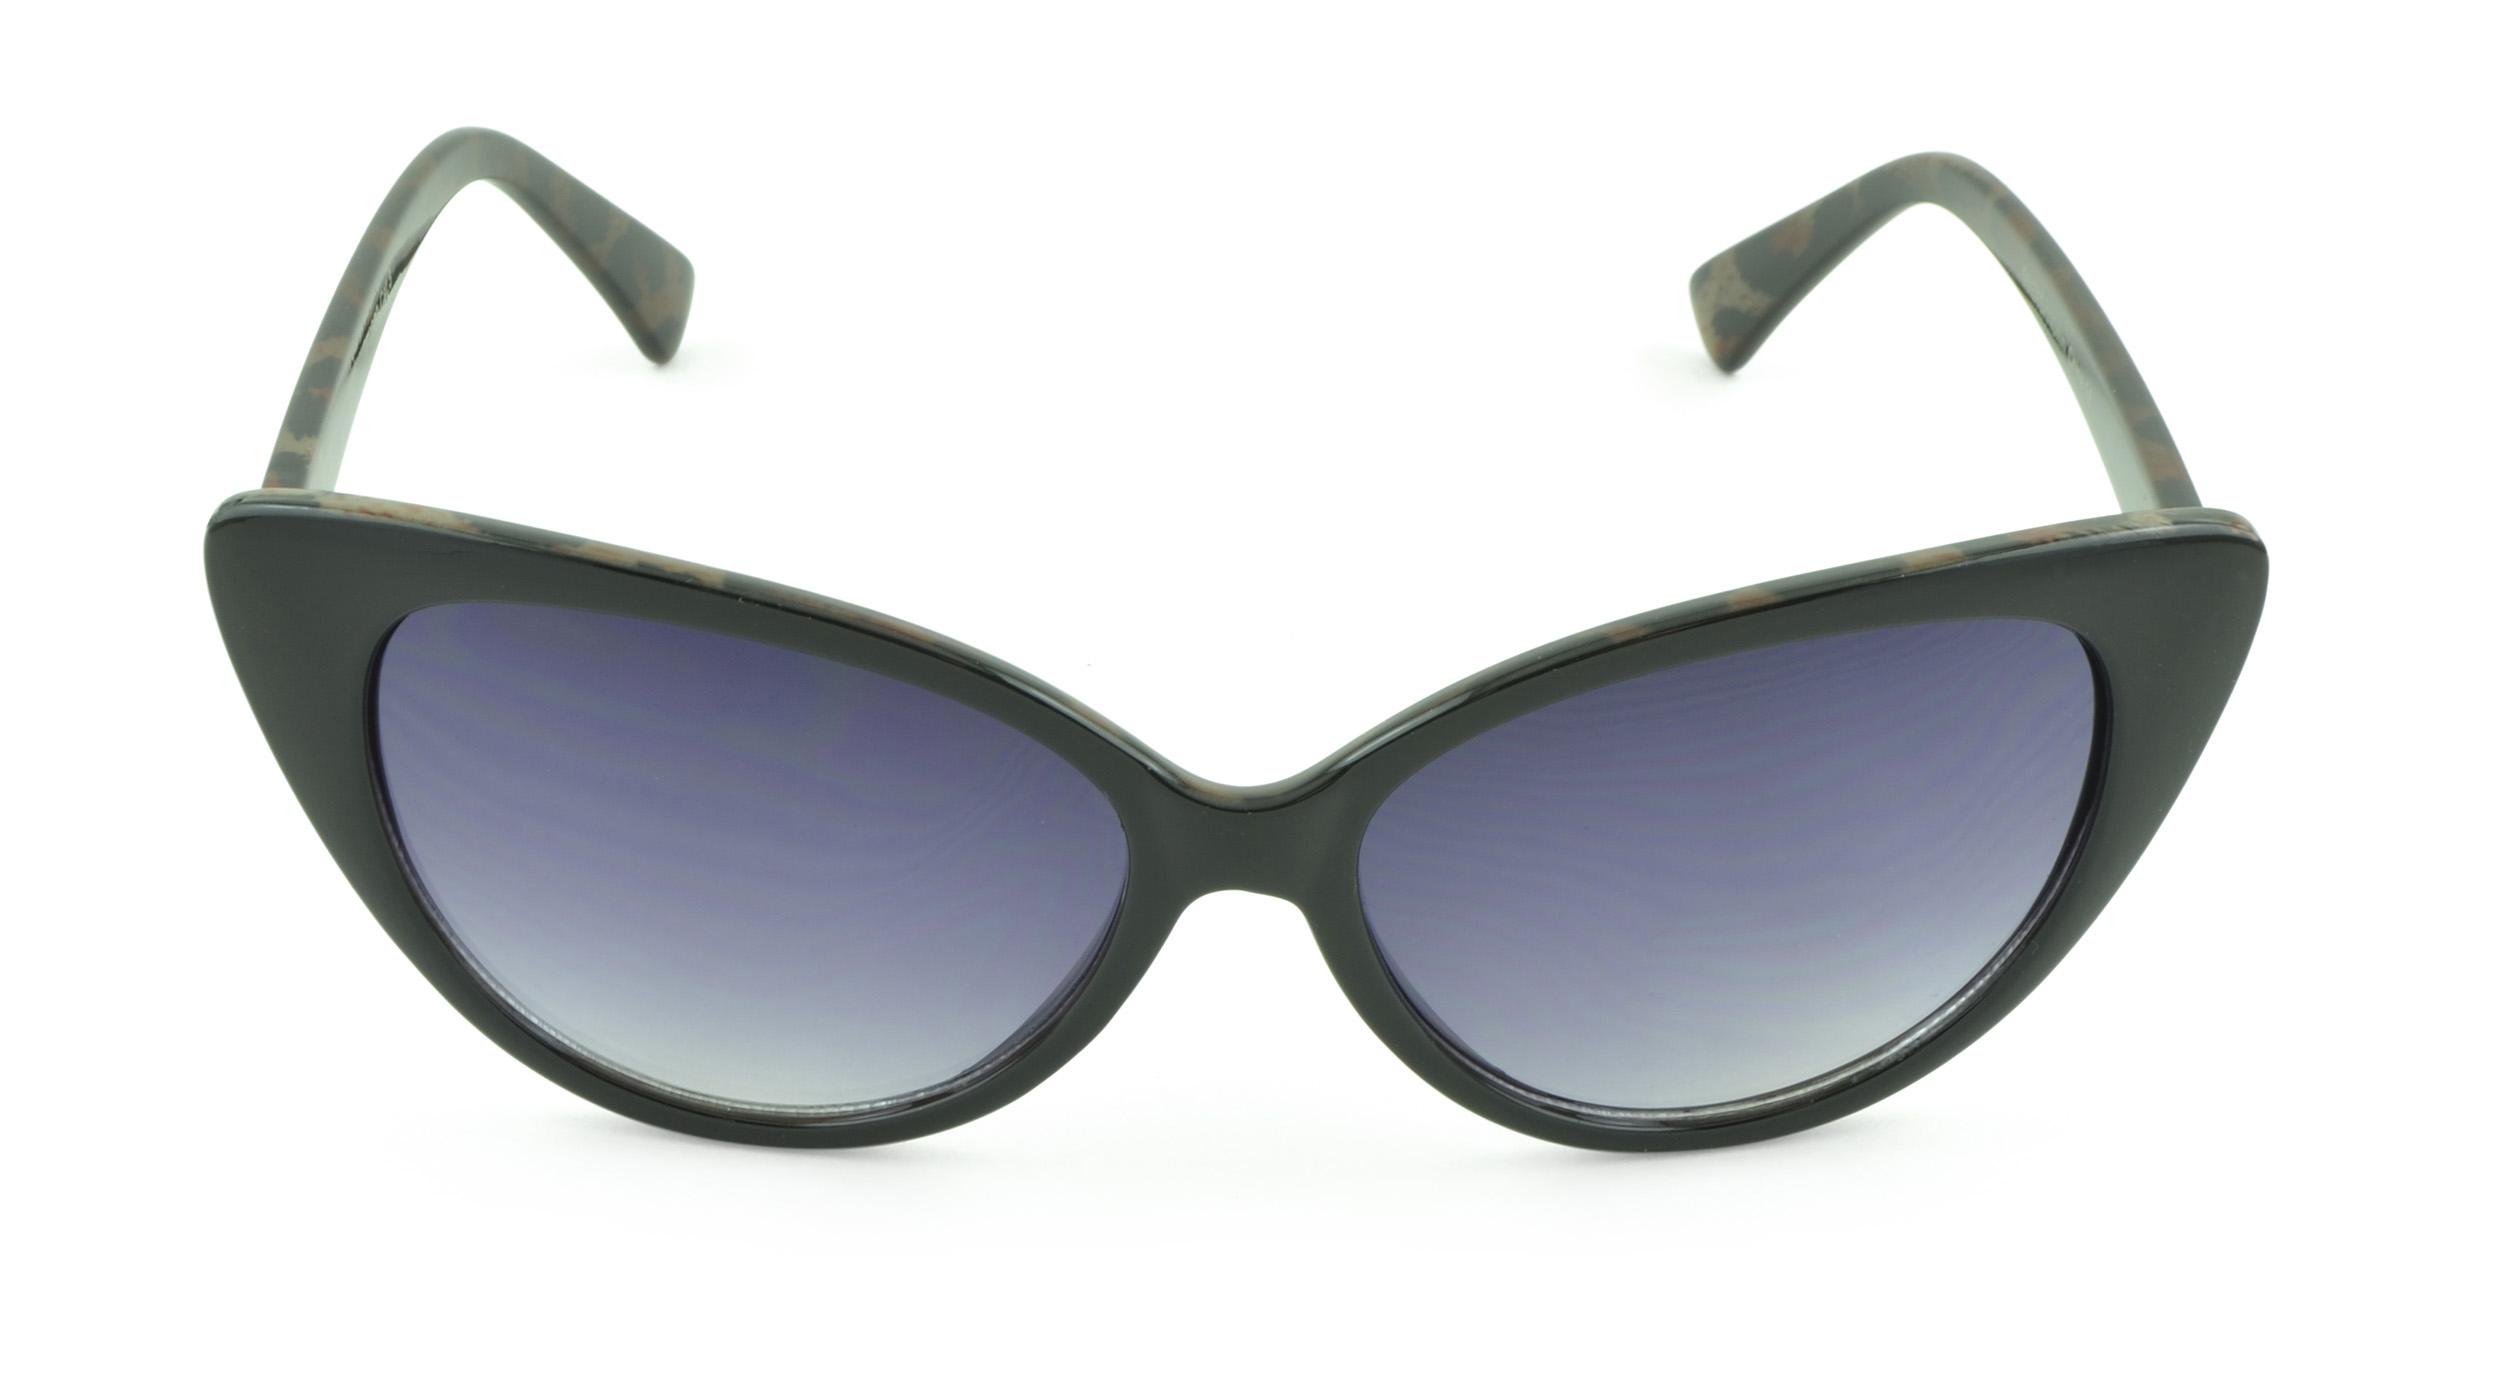 Belle Donne - Women's Fashion Kitten Retro Cat Eye Sunglasses - Black Cheetah